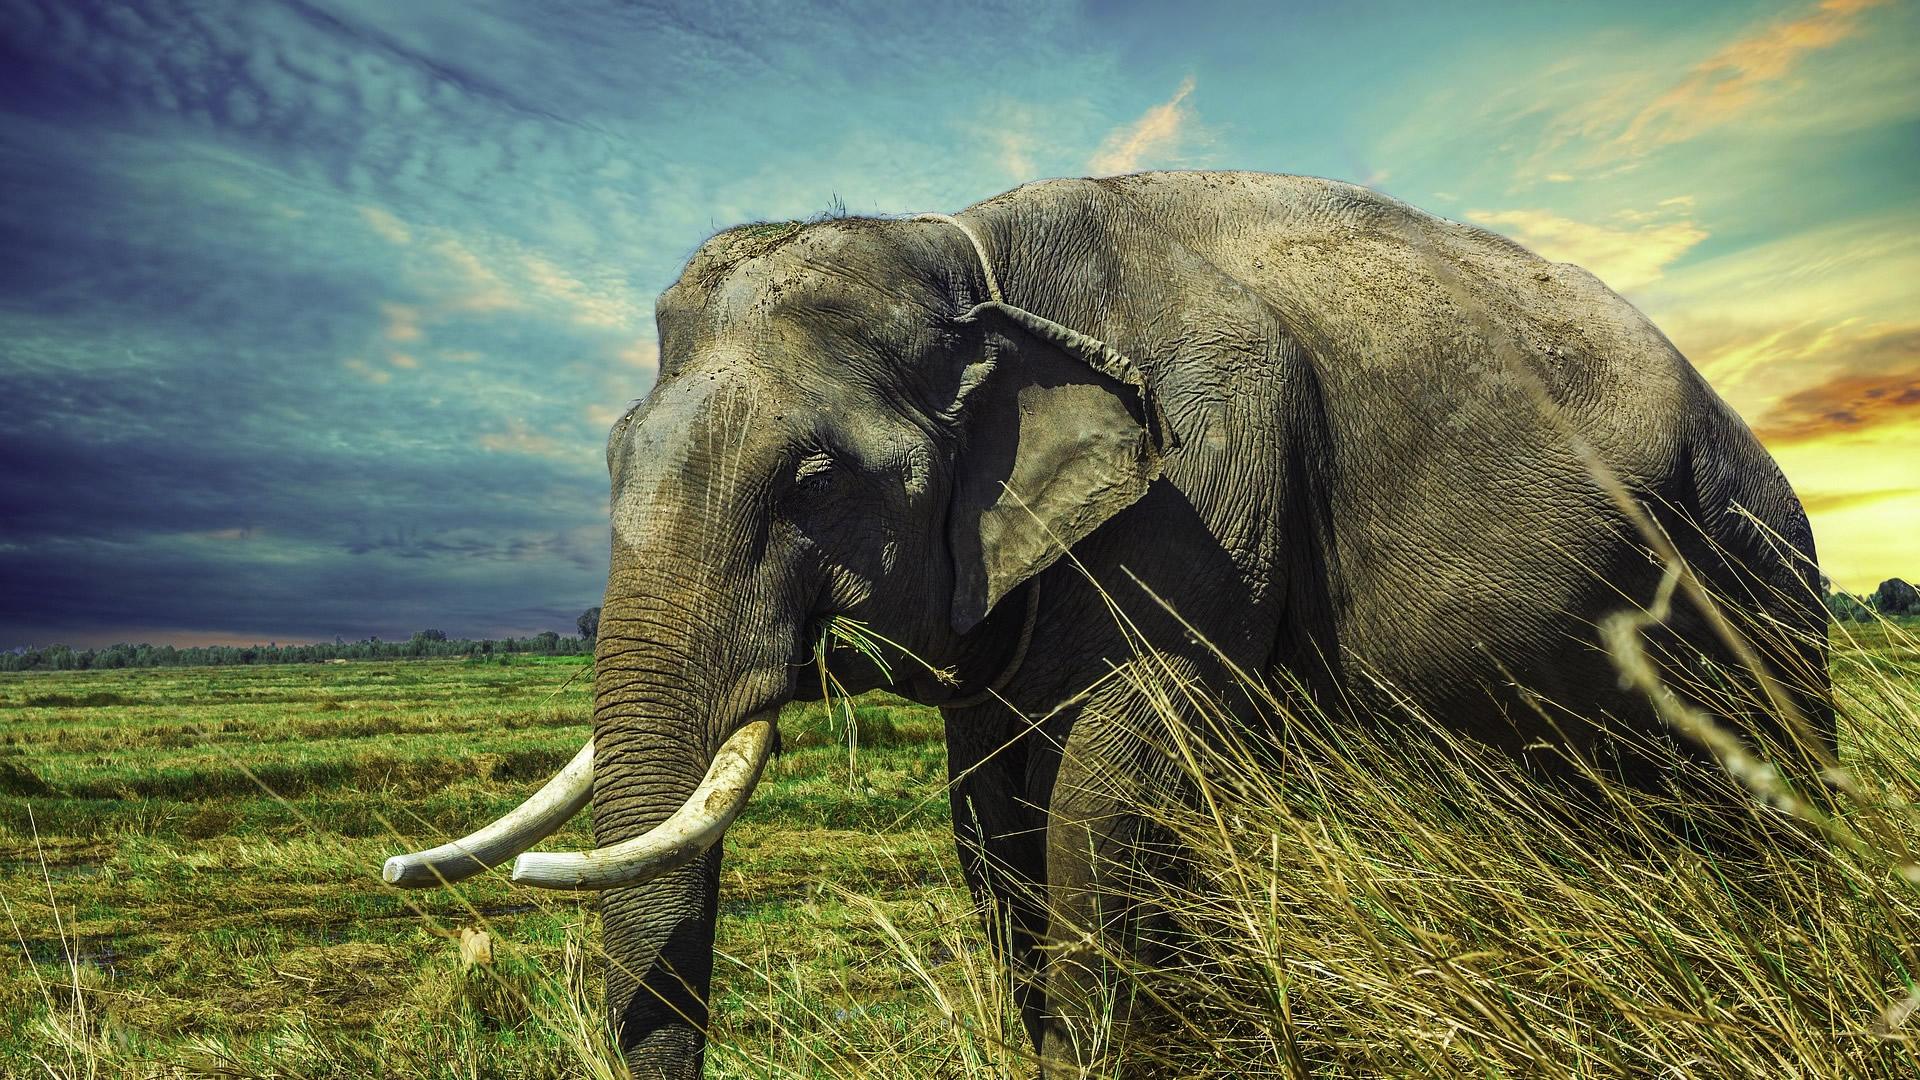 Elephant Wallpaper Elephant Hd HD Wallpaper